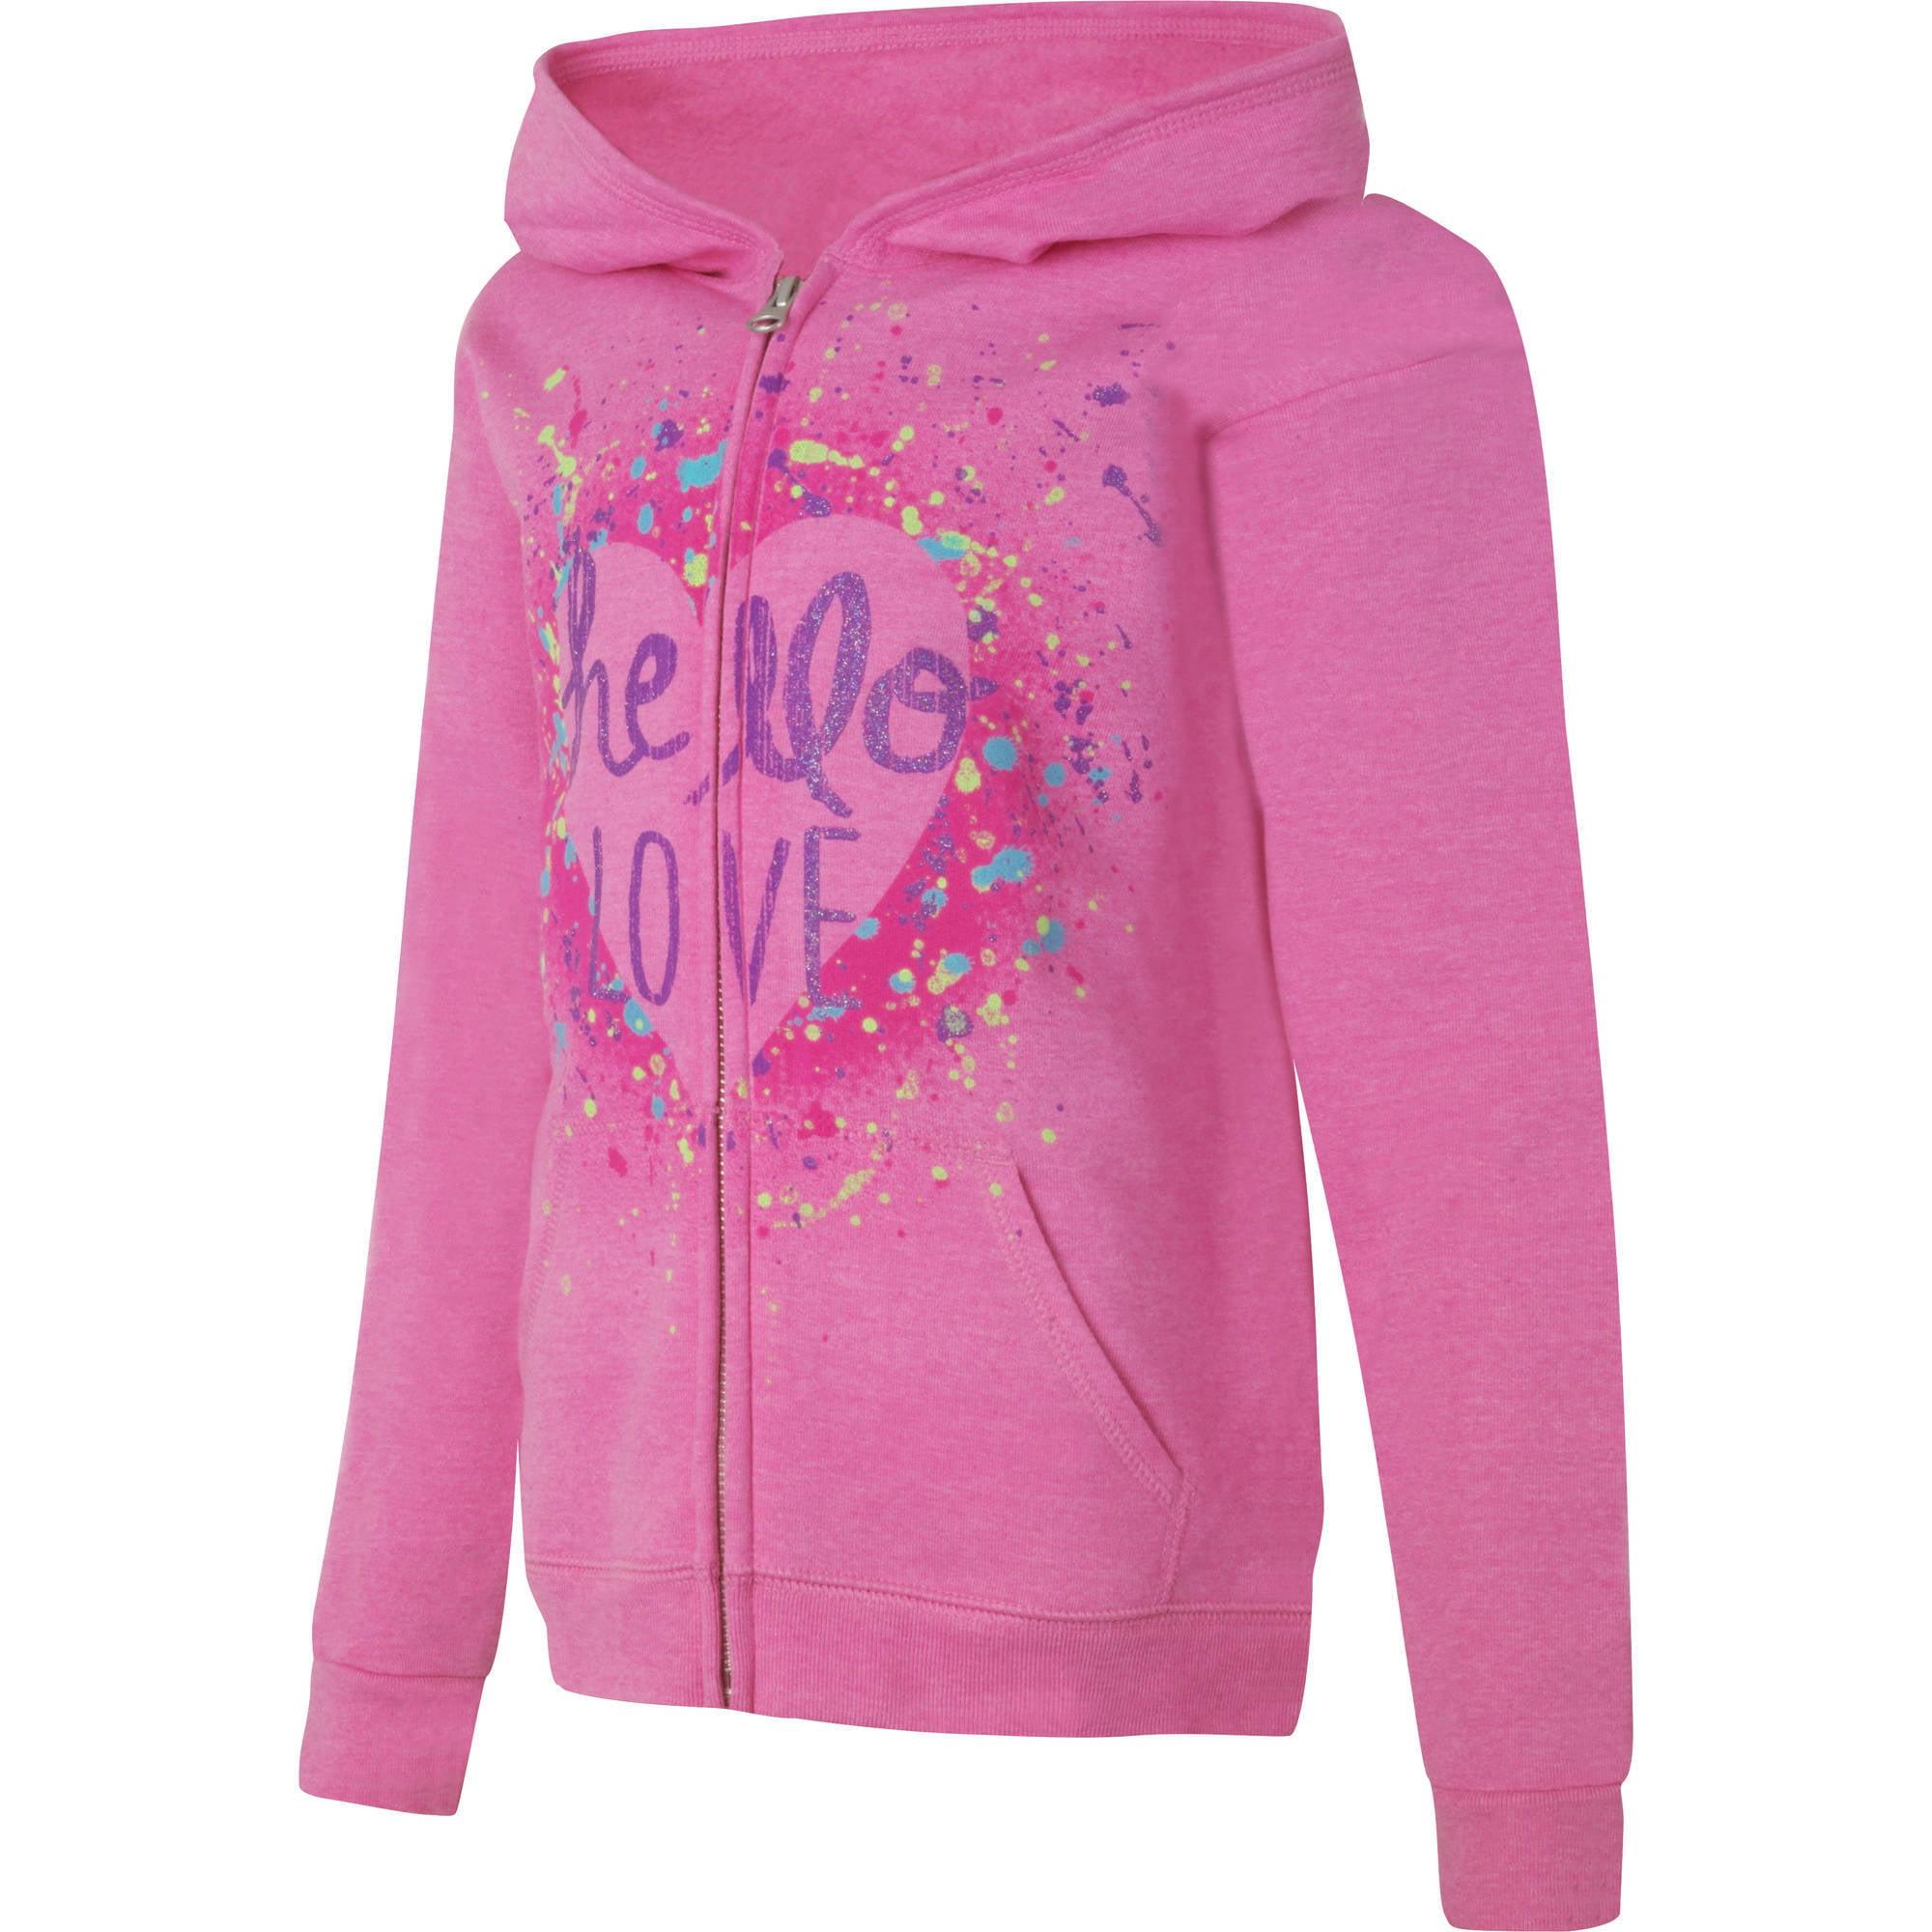 Hanes Girls' Printed Fleece Zip Hood Jacket